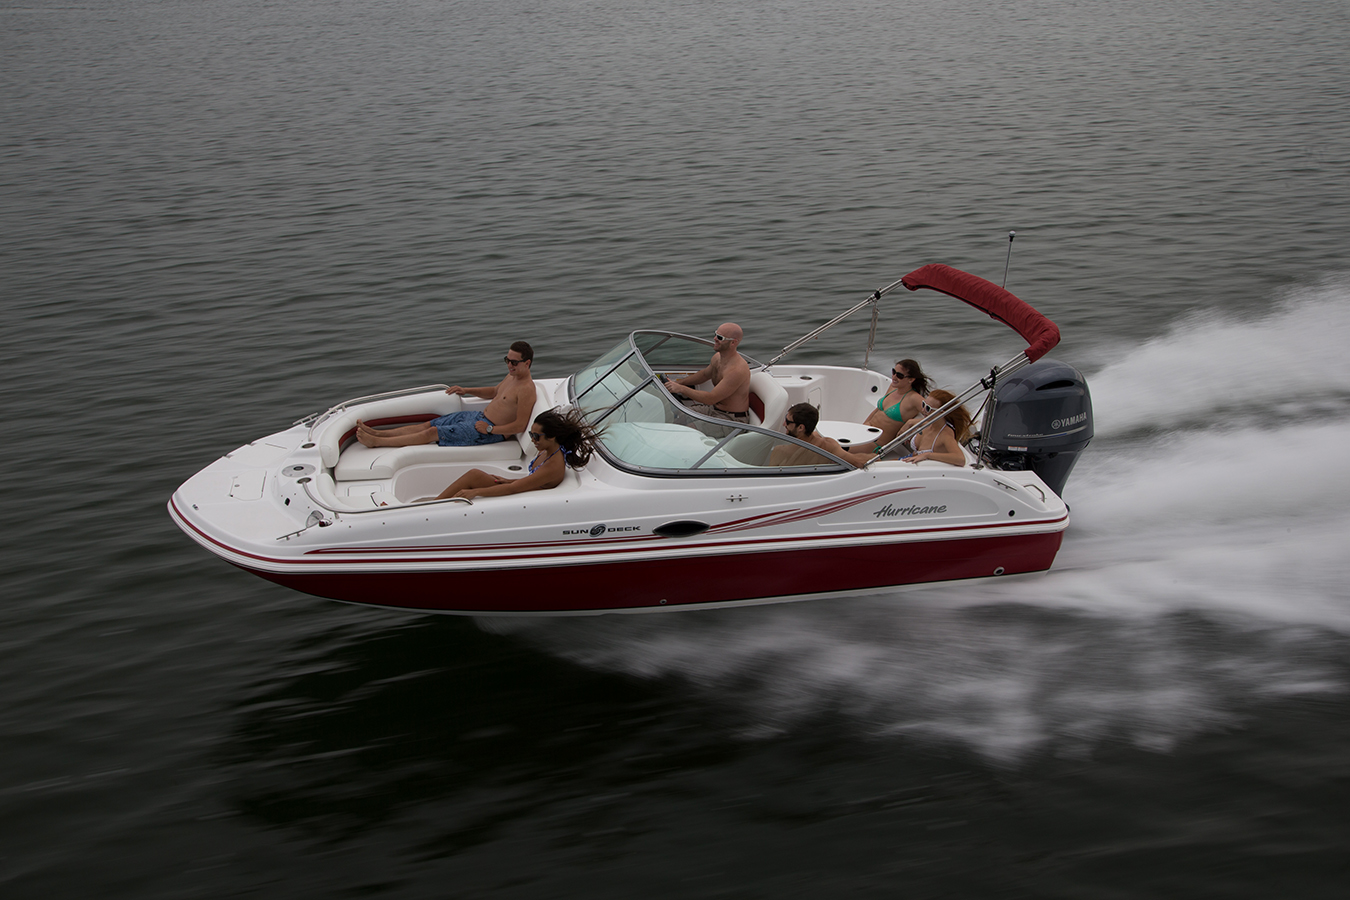 Paradise Boat Rentals 3013 Del Prado Blvd S Cape Coral